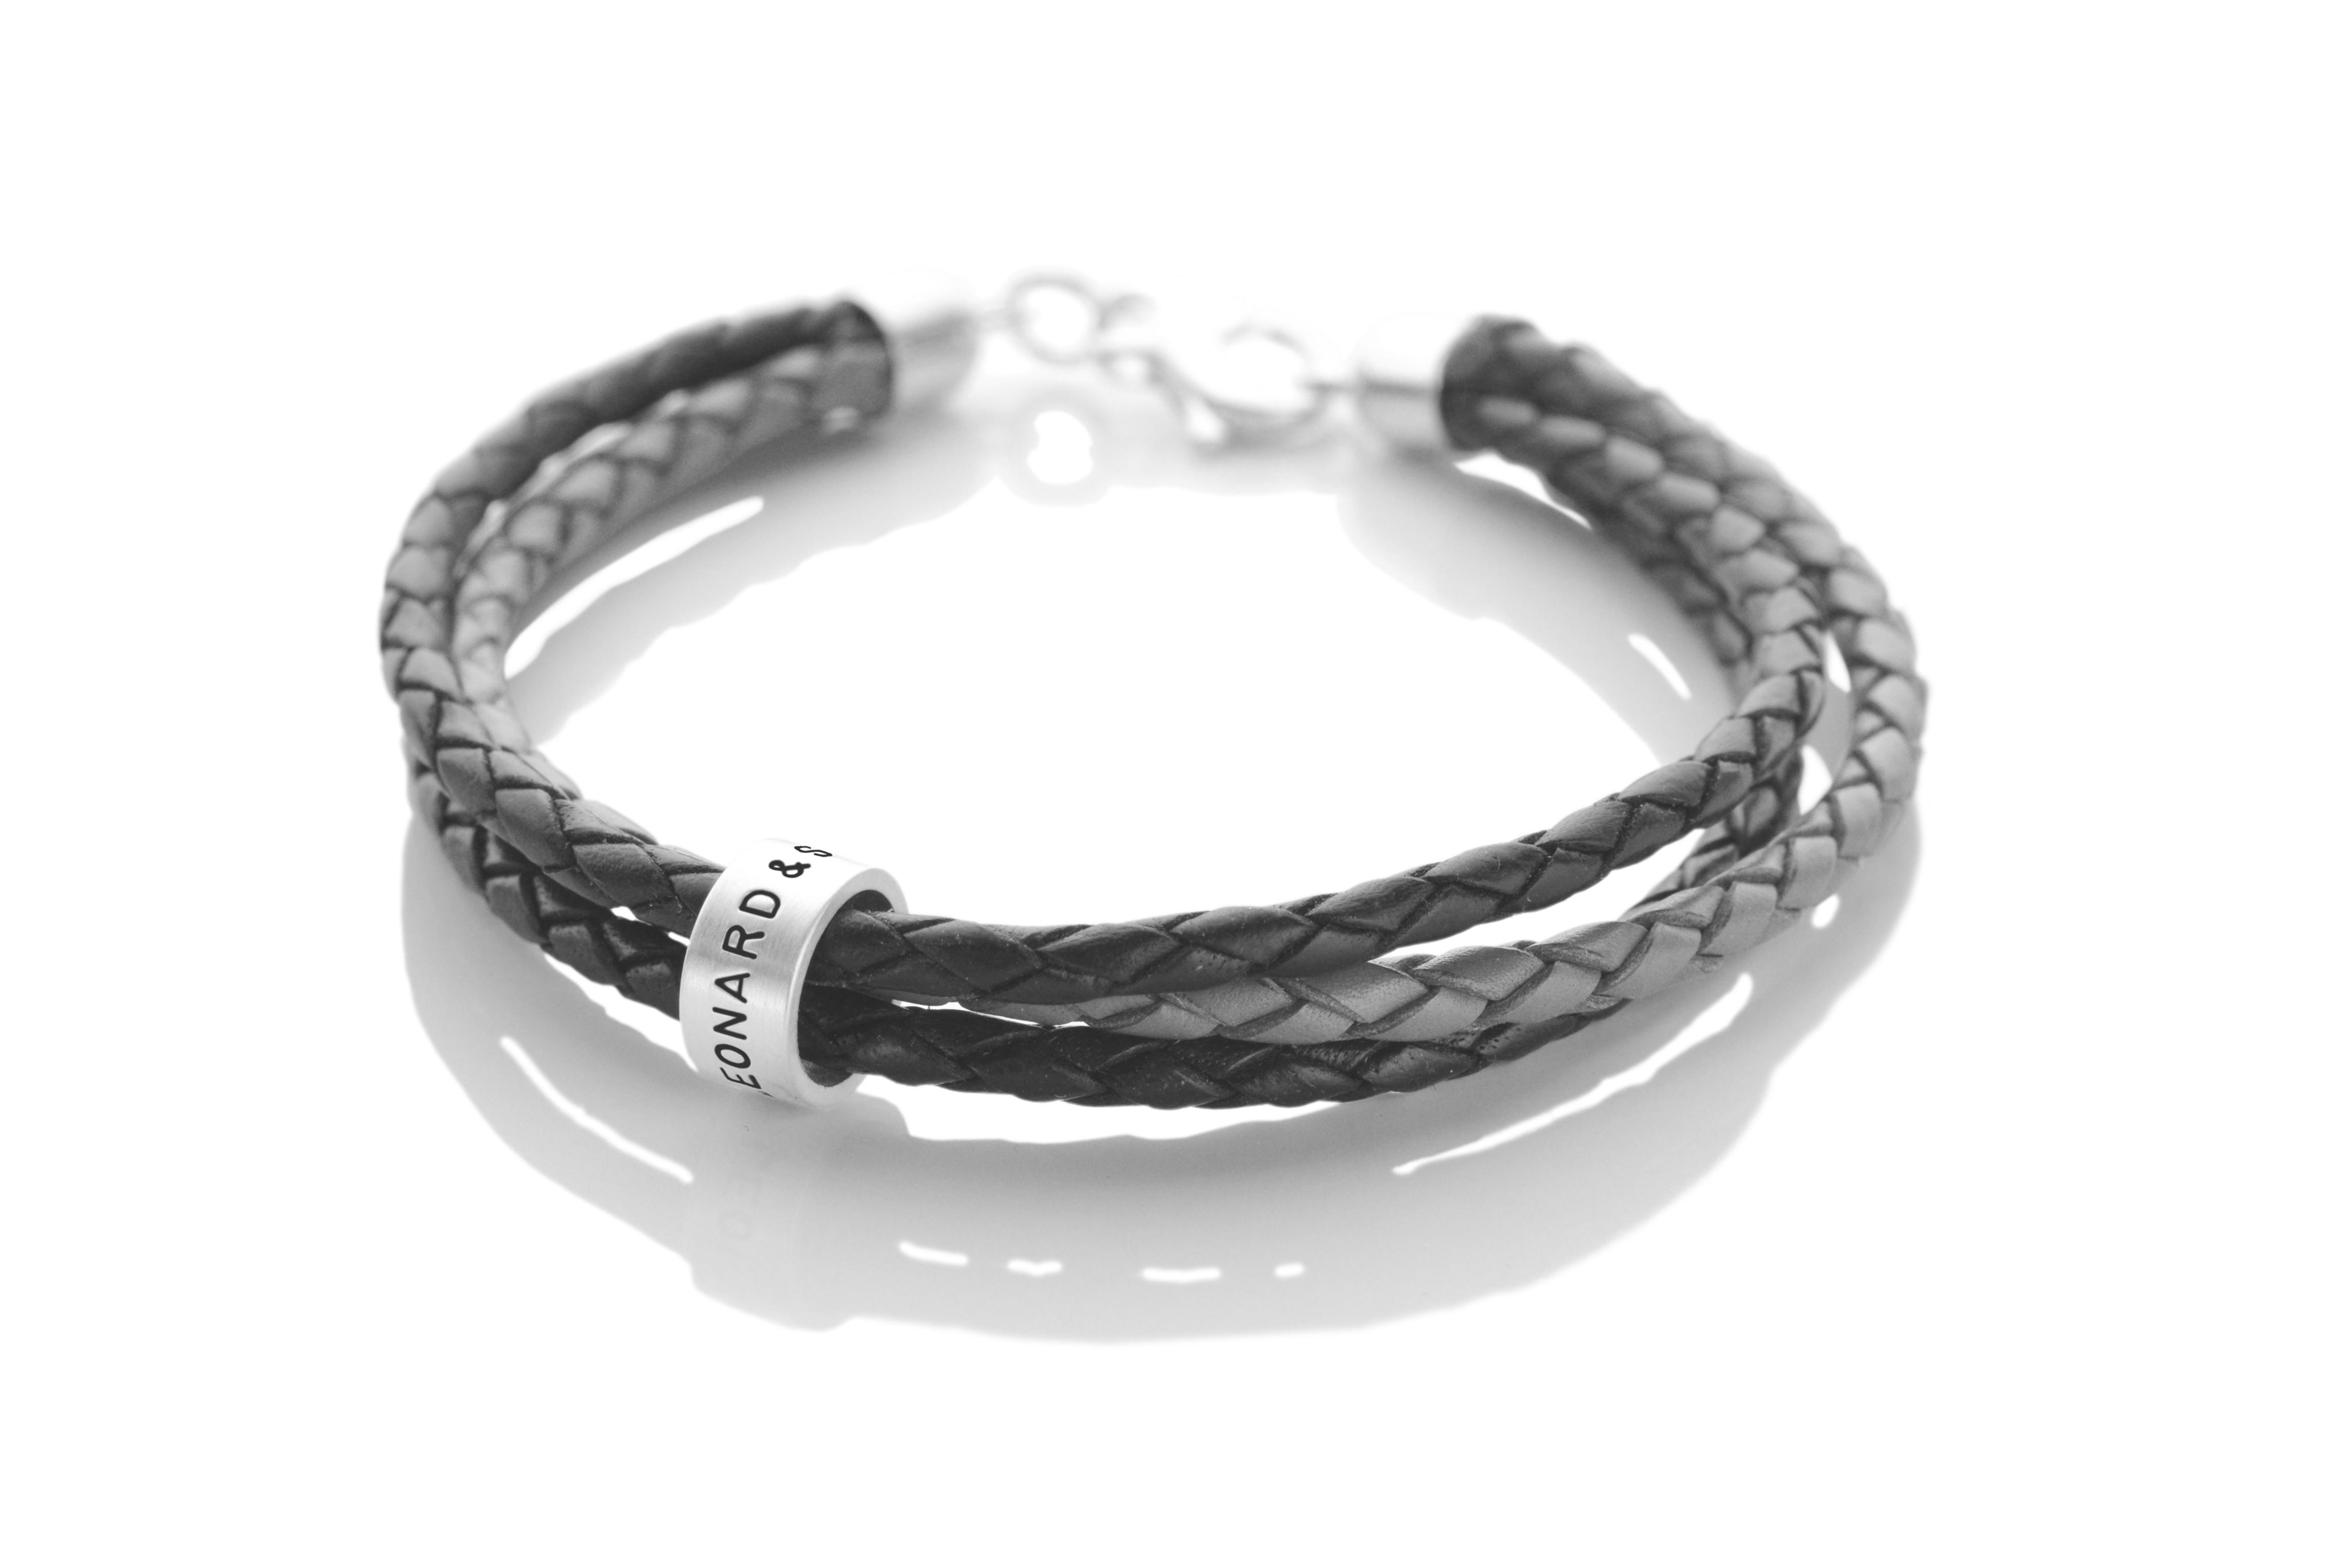 lederarmband 3 in 1 roll 925 silber armband namensgravur m nnerschmuck. Black Bedroom Furniture Sets. Home Design Ideas